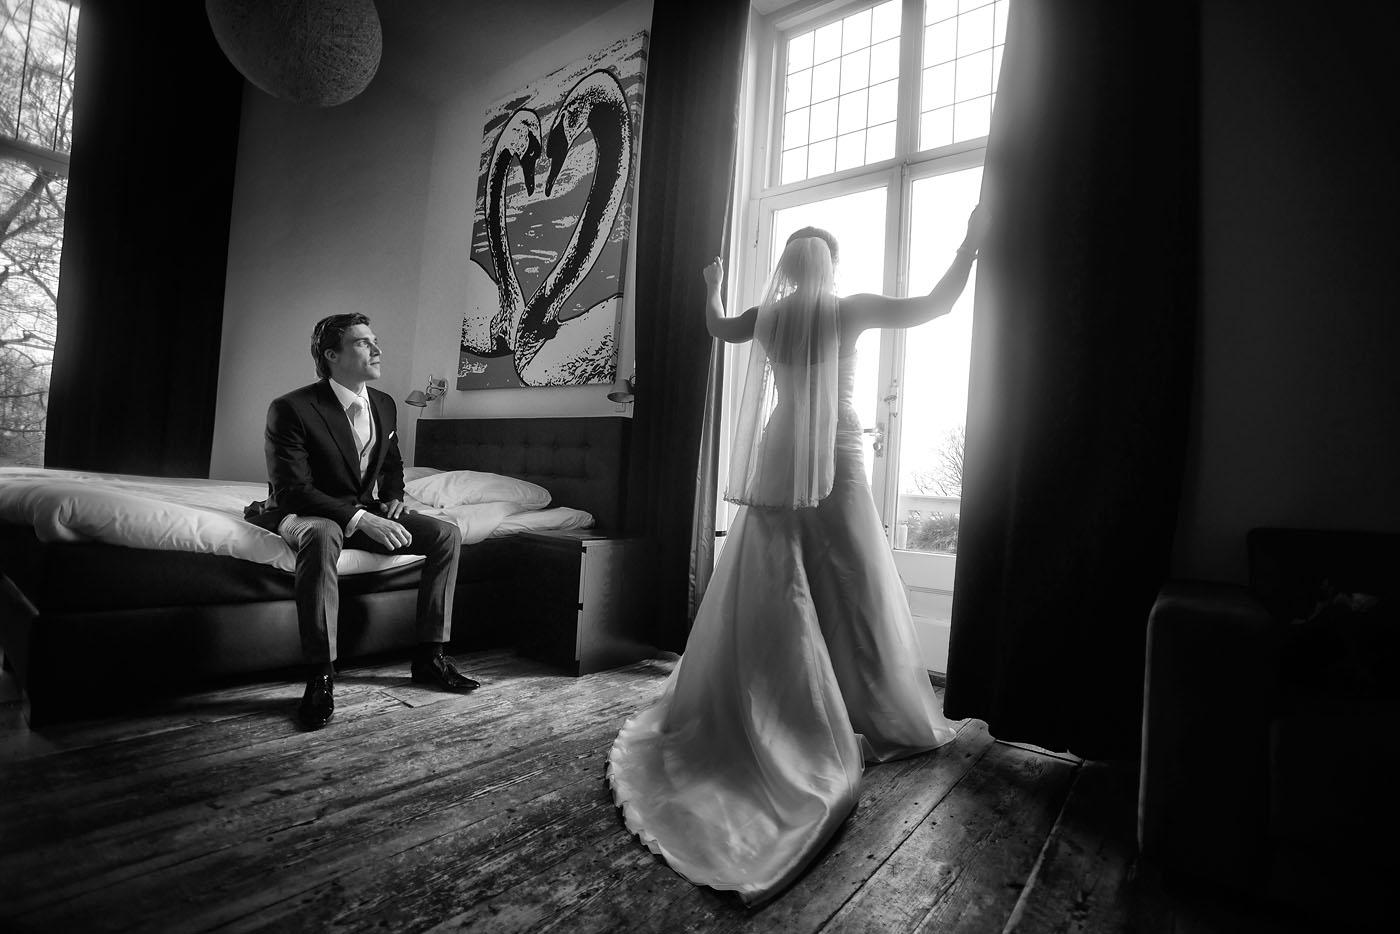 Rhederoord DeSteeg huwelijksdag